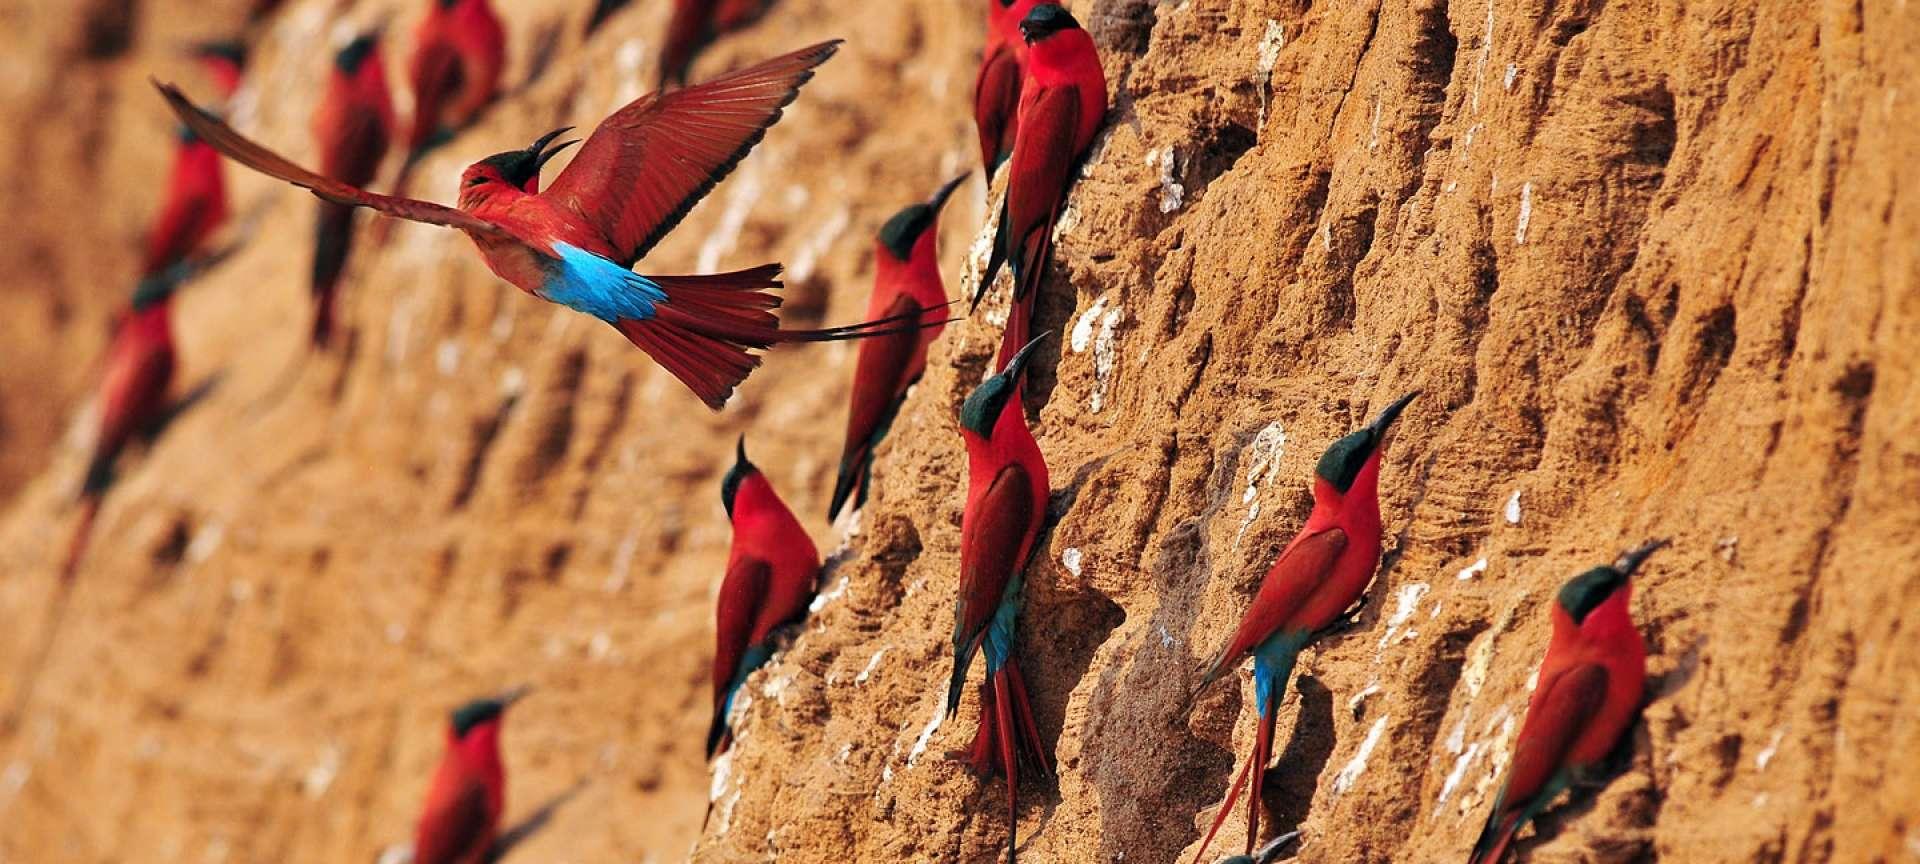 South Luangwa National Park - Africa Wildlife Safaris